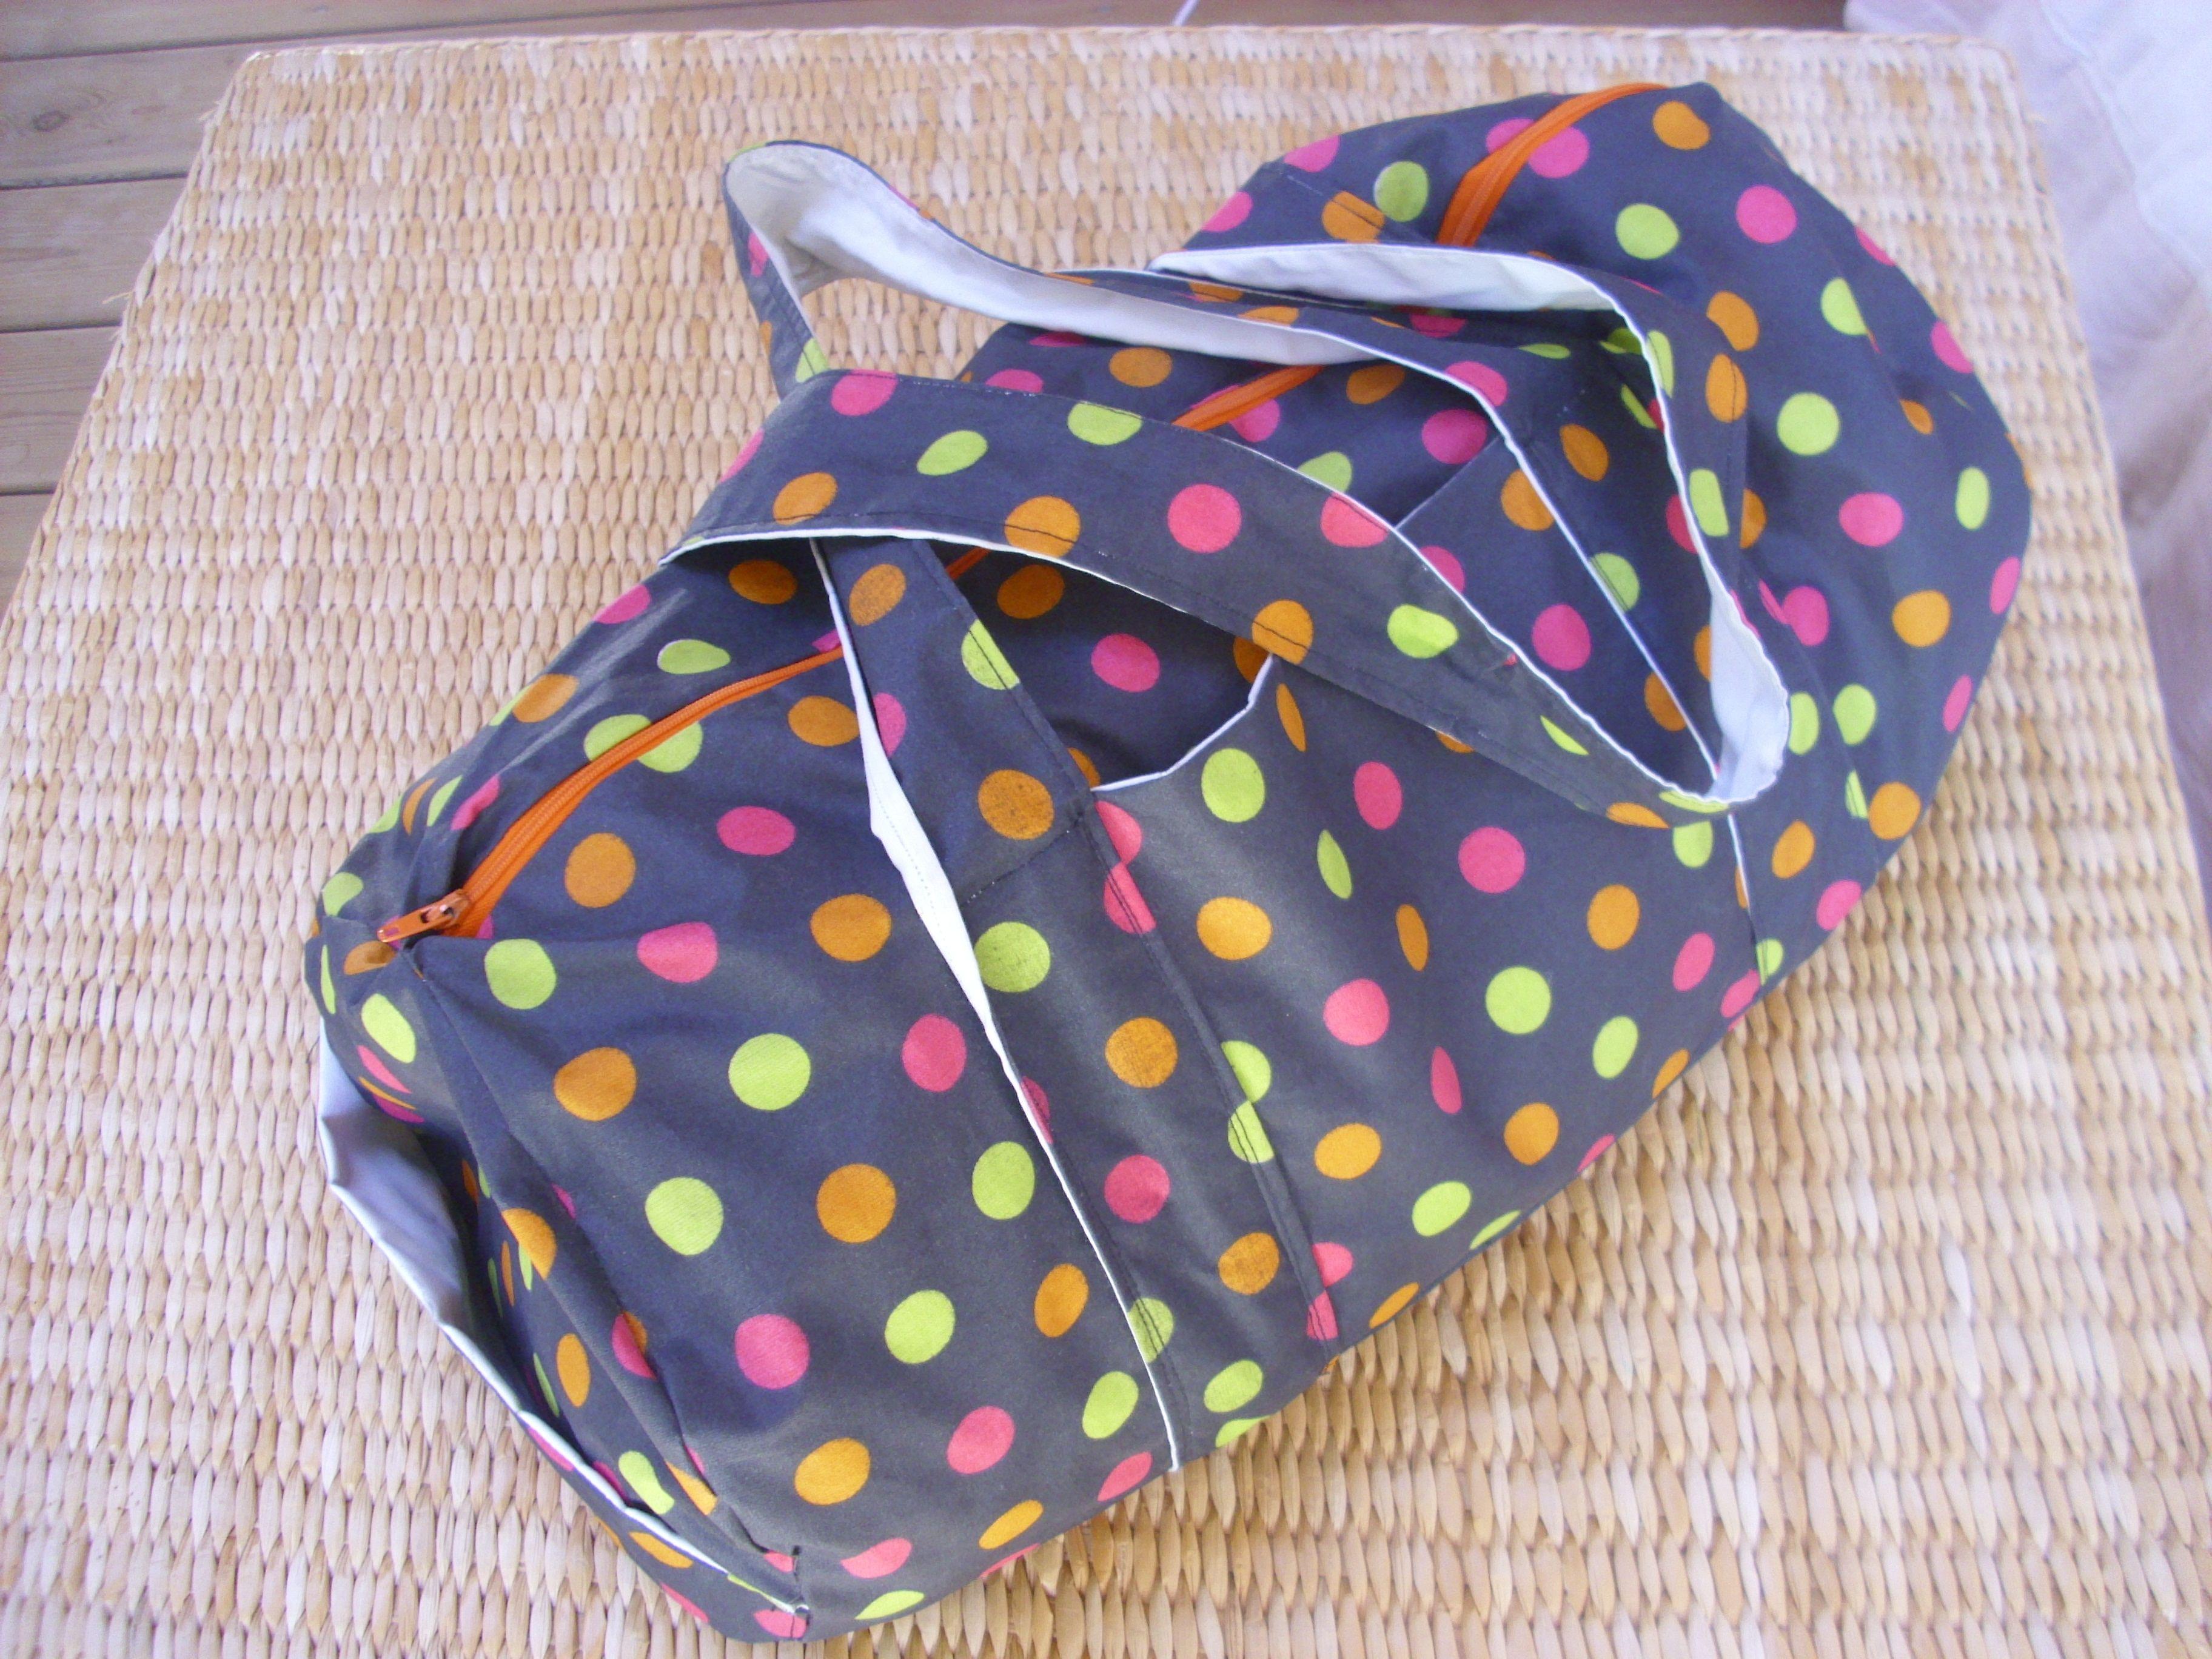 Tuto sac de sport couture diy pinterest sac de sport - Tuto sac de sport ...